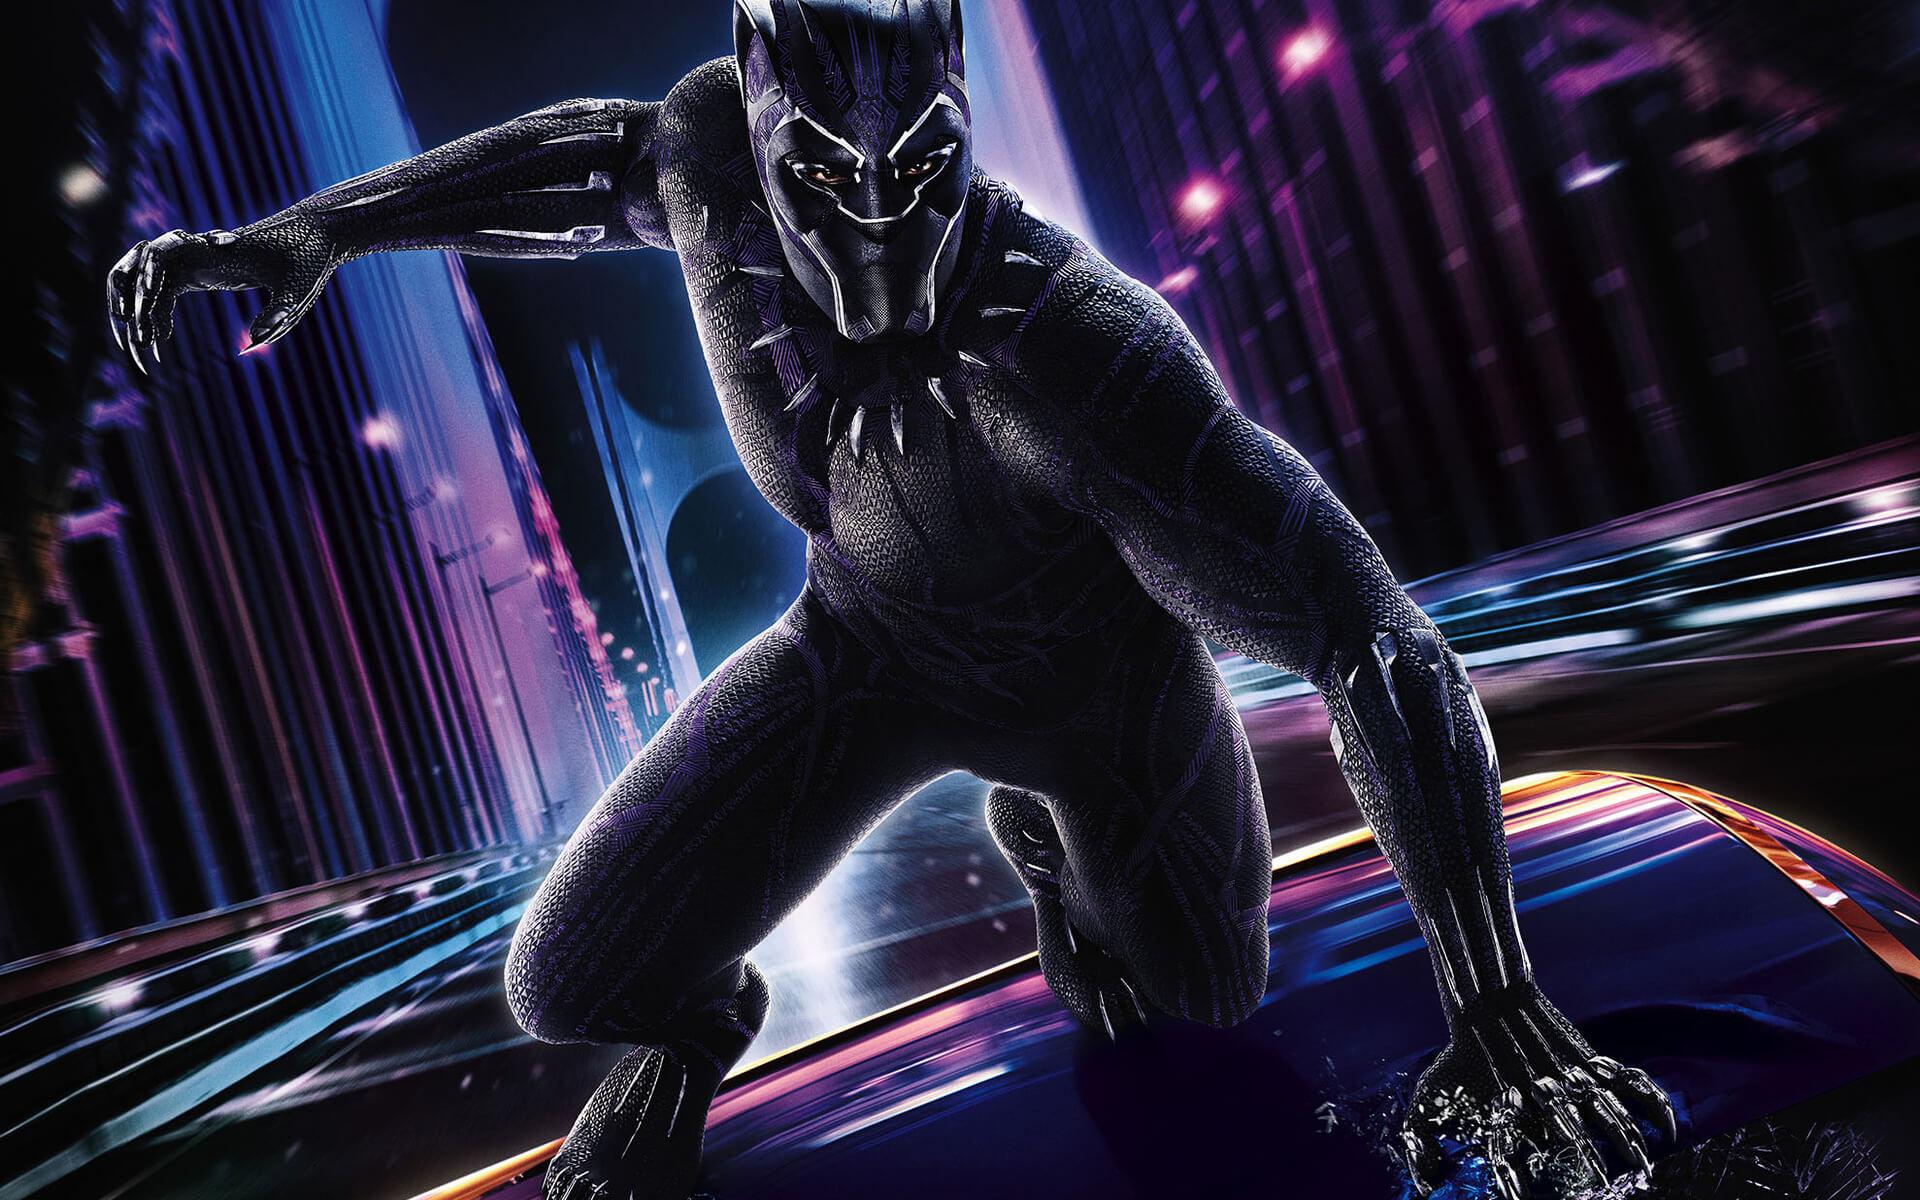 Black Panther Script Teardown - Featured Image